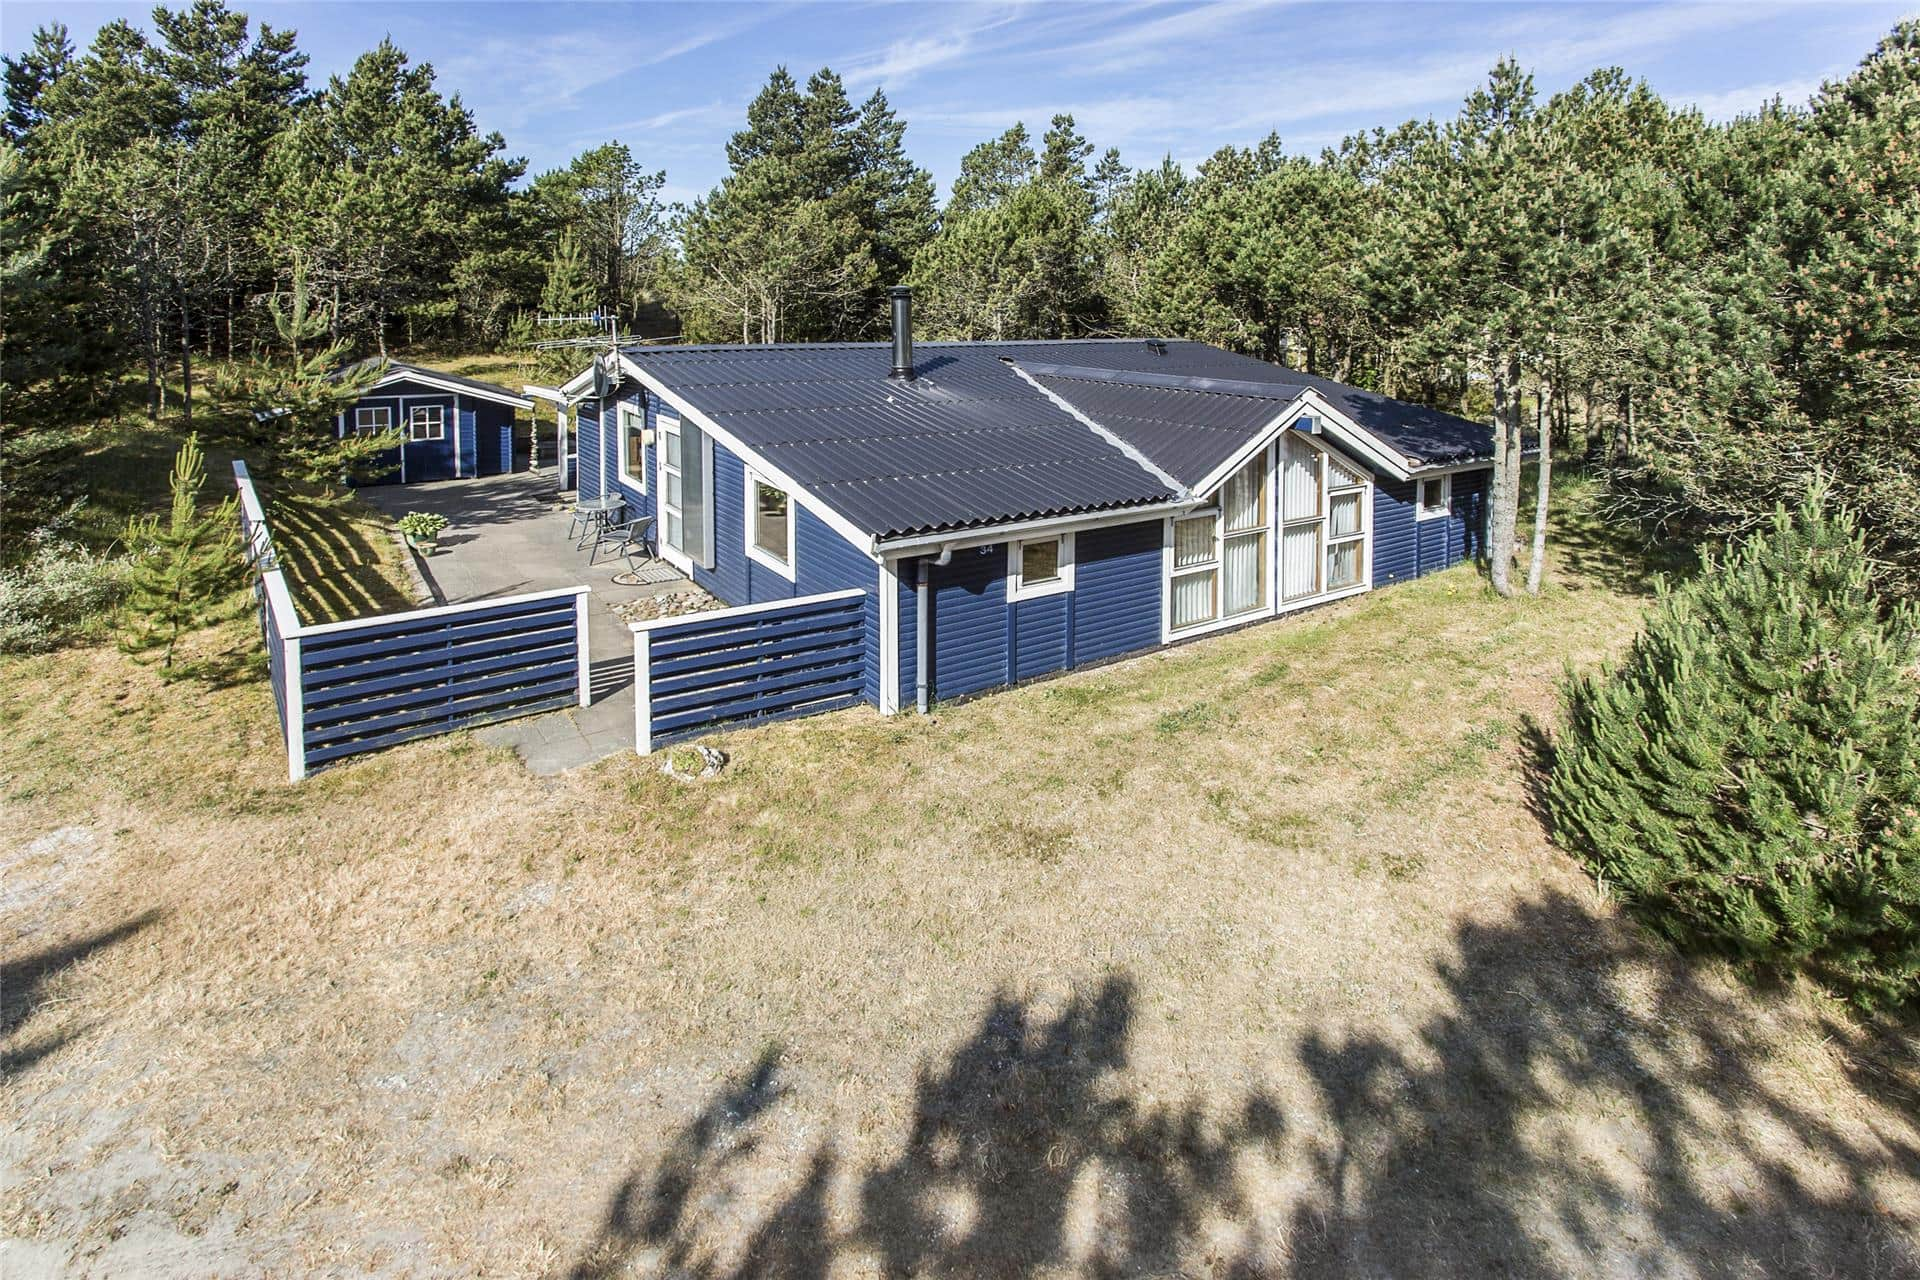 Billede 1-13 Sommerhus 257, Blåmunkevej 34, DK - 7700 Thisted